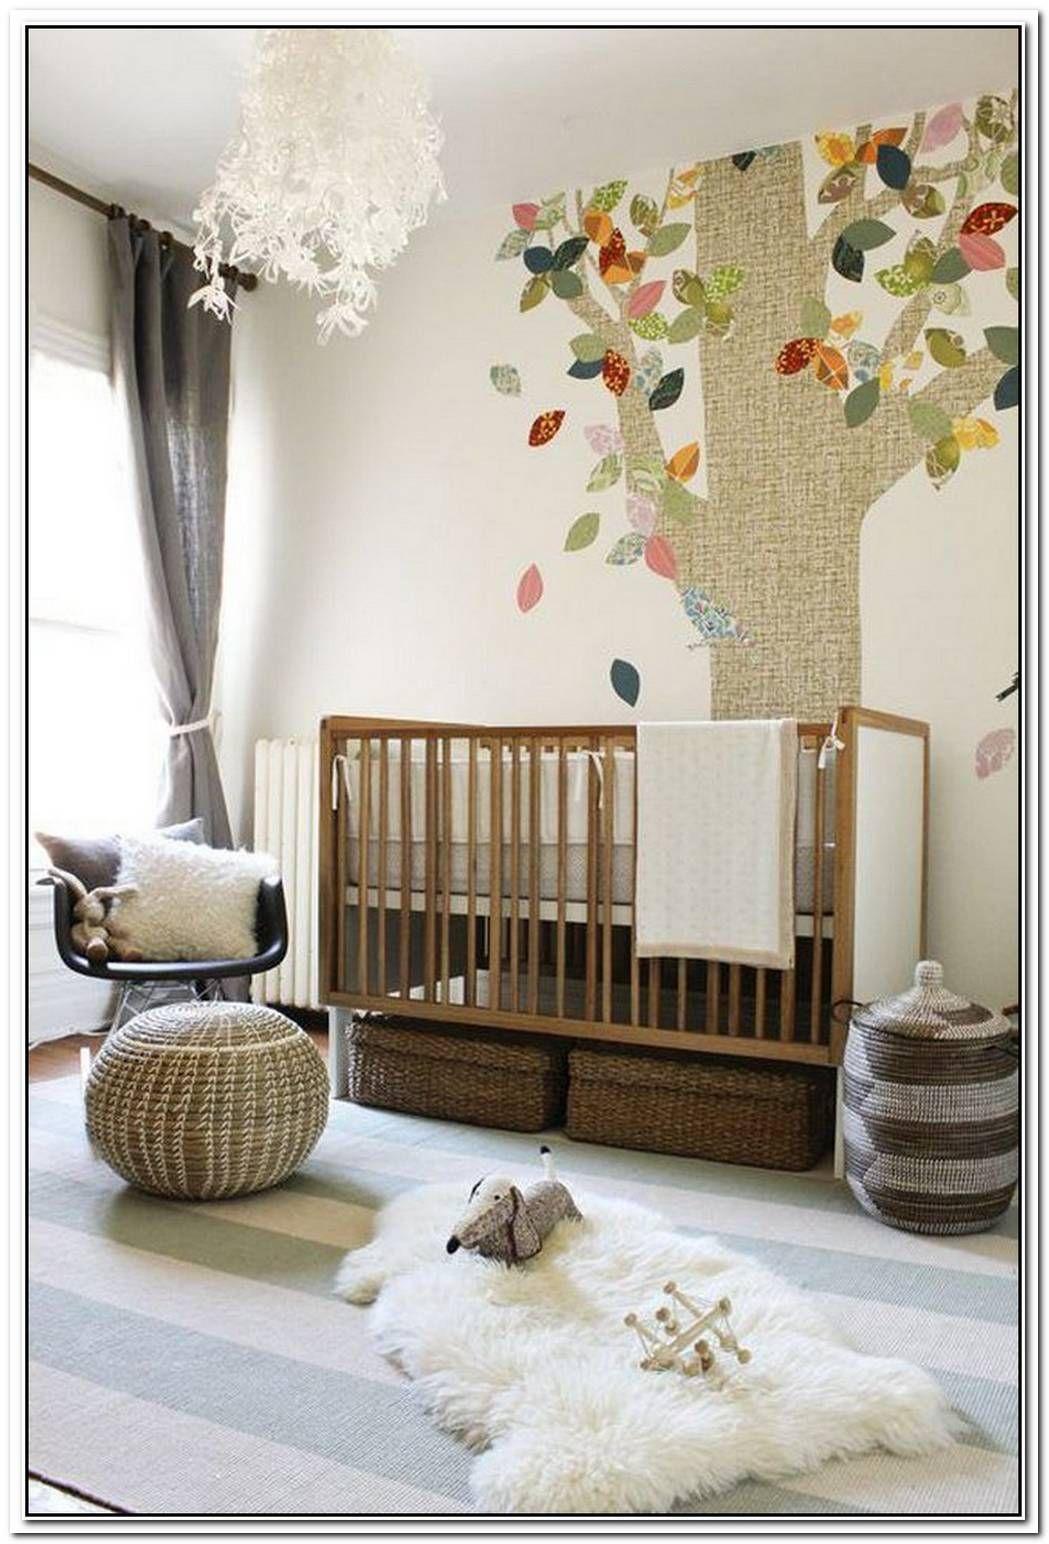 14 Ideas For Creating A Stylish Boy'S Nursery Ikea baby